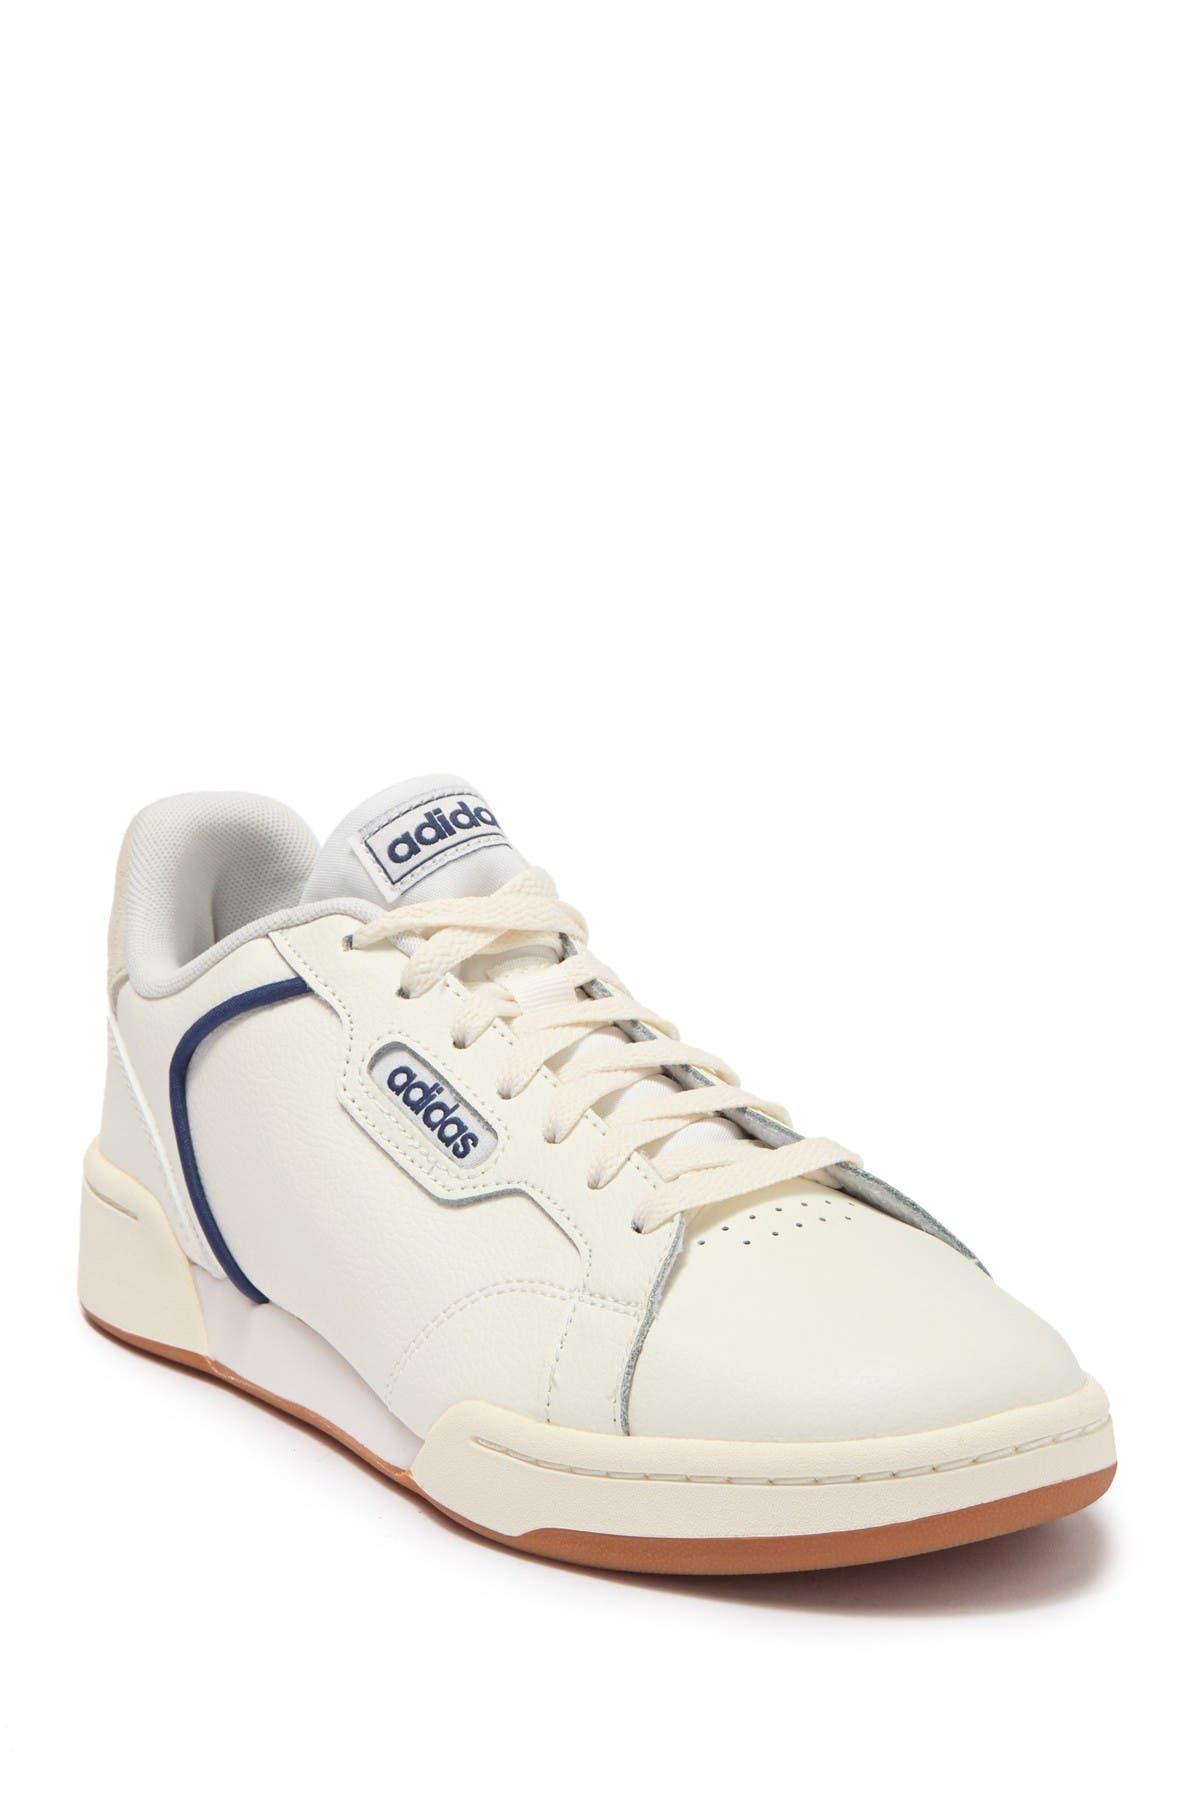 Image of adidas Roguera Sneaker